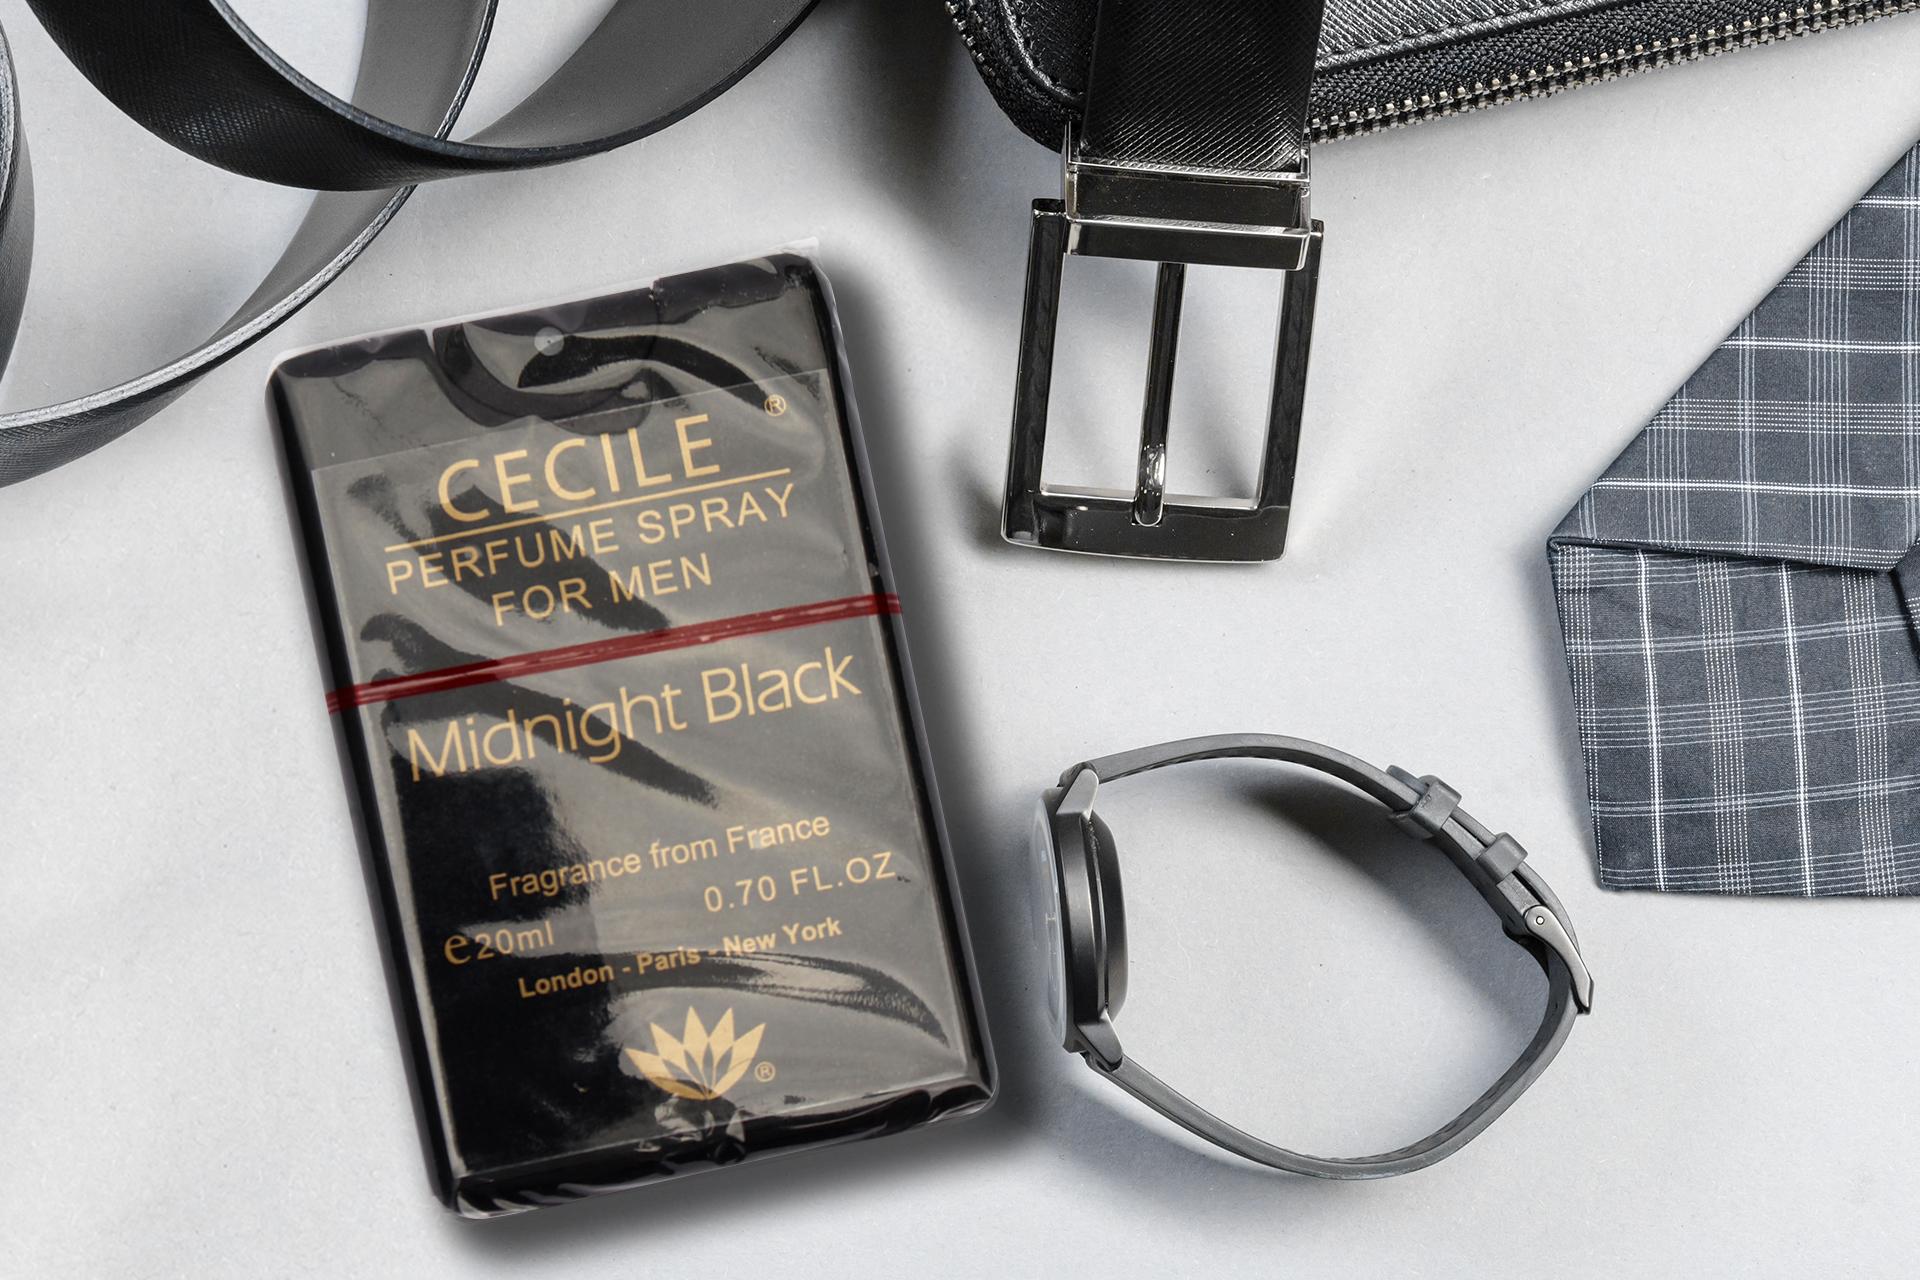 https://www.orbitsarl.com/wp-content/uploads/2017/08/Product-Perfume_Cecile_MidnightBlack-20ml_1920x1280-FIN.jpg